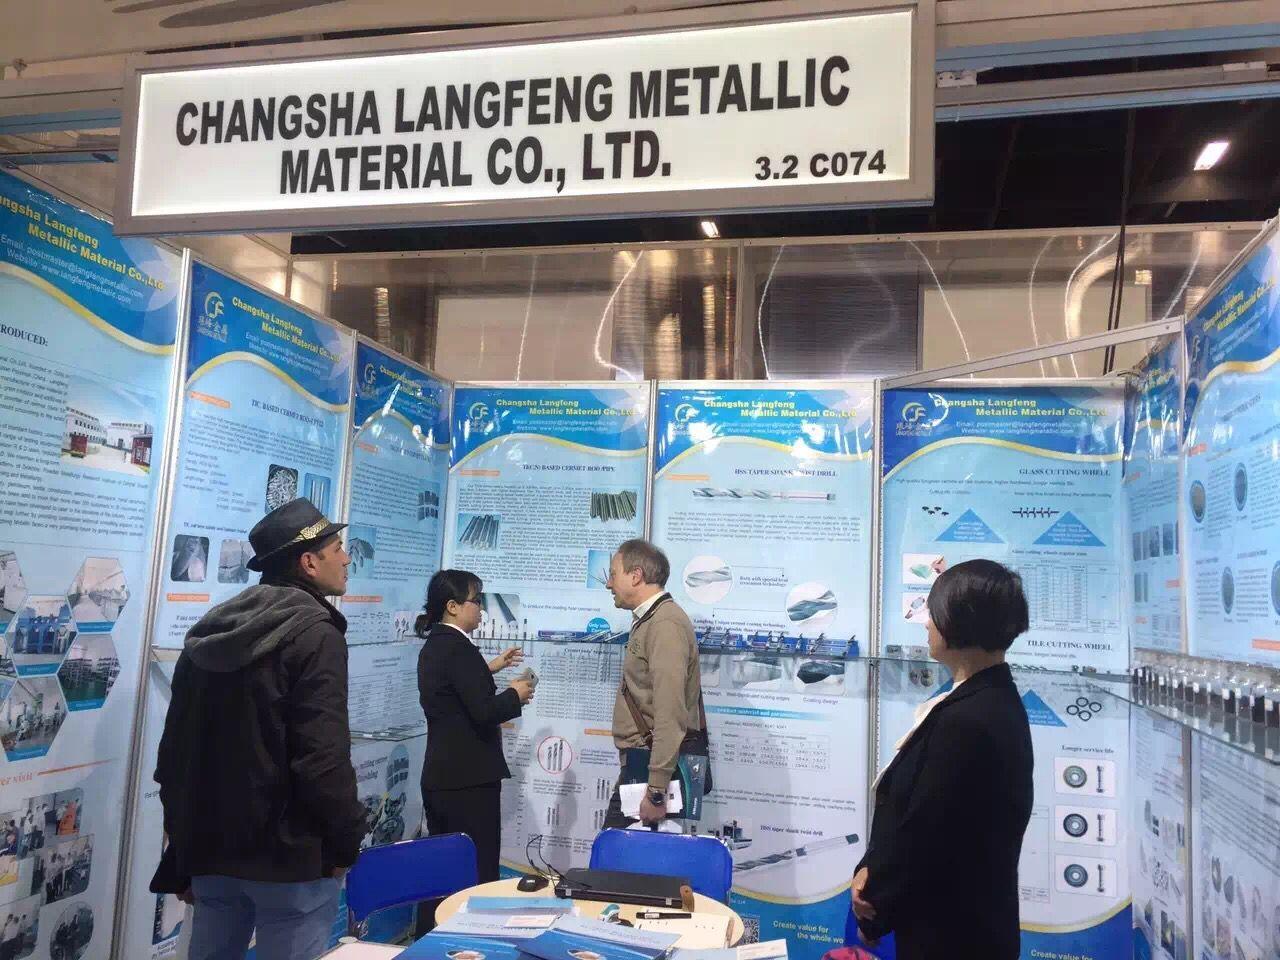 Changsha Langfeng Metallic Material system | Langfeng Metallic Material CMS